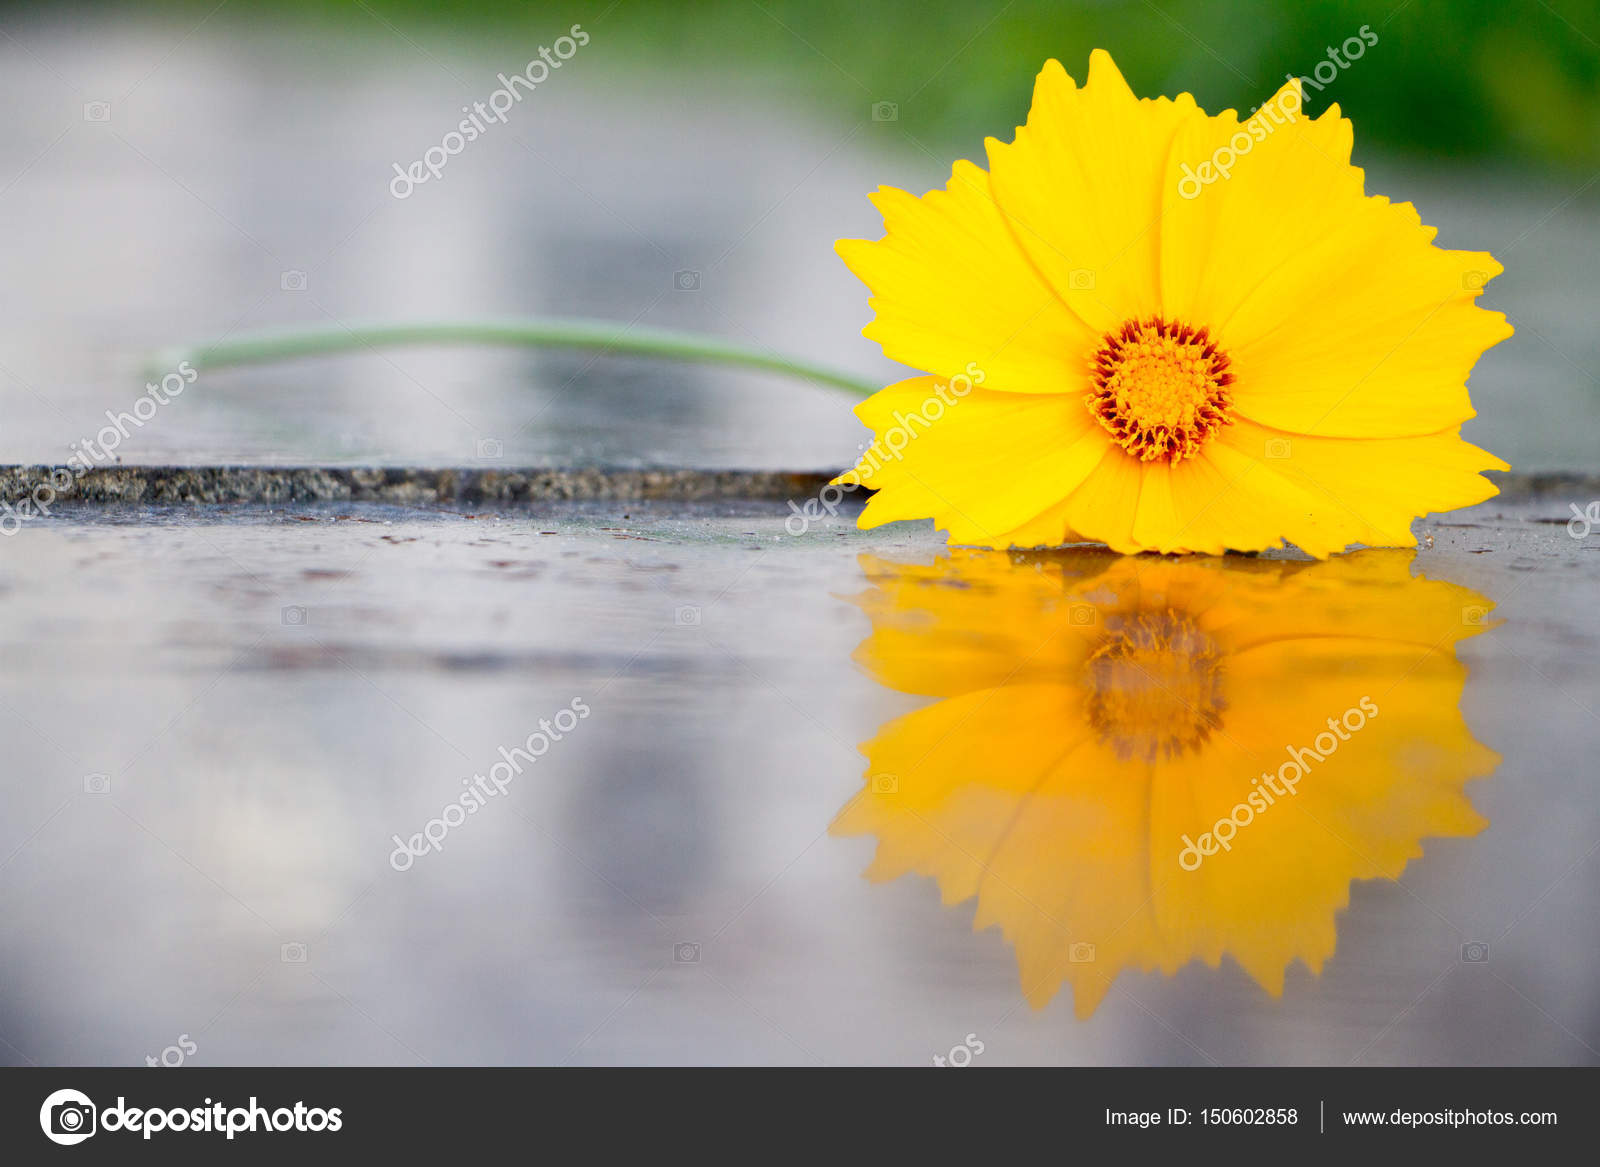 Beautiful yellow flower called cosmos sulphureus stock photo beautiful yellow flower called cosmos sulphureus lies on a polished granite slab photo by ramann mightylinksfo